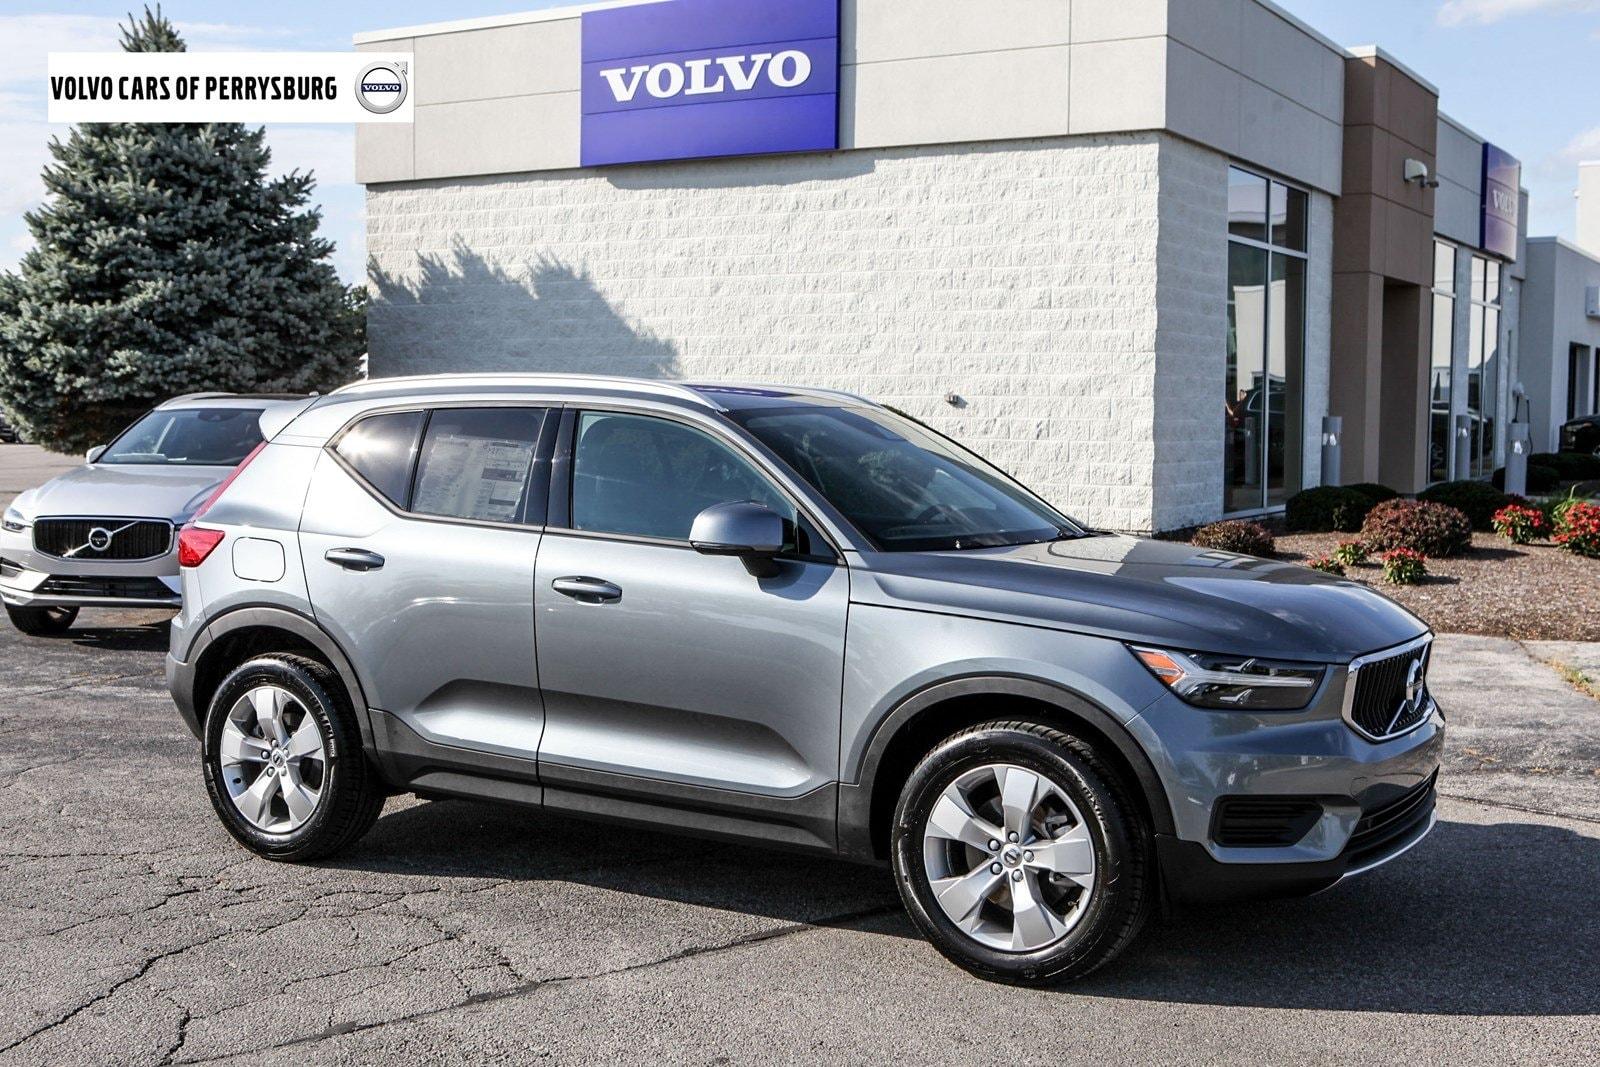 2019 Volvo XC40 T4 Momentum SUV for Sale Near Toledo, OH